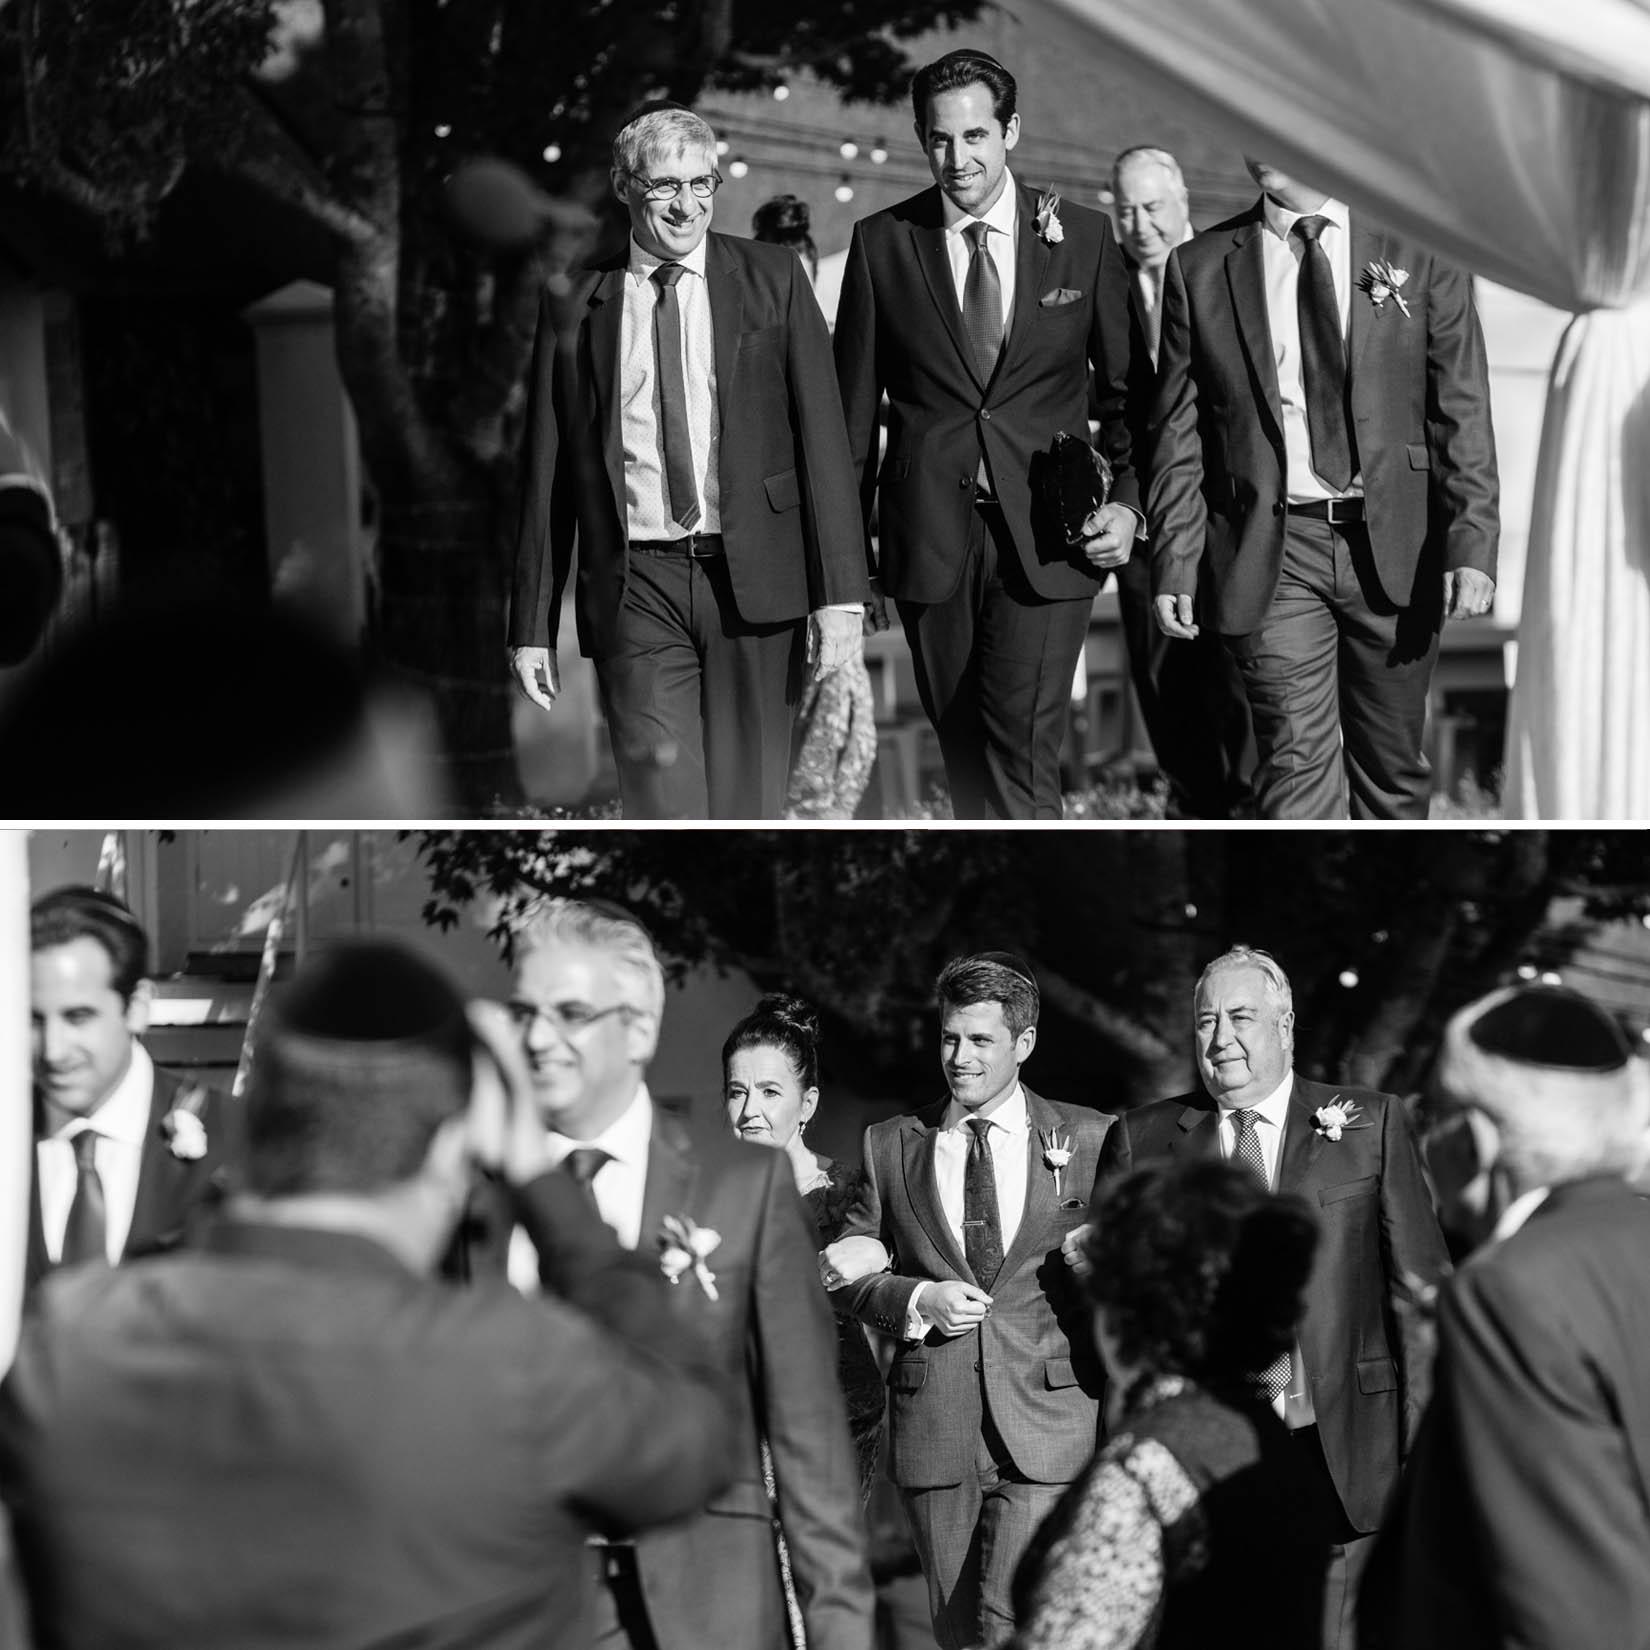 Leon_&_Martine's_Wedding_Photographs_17th_April_2019_@johnhenryweddingphoto_Low_Resolution_Web-216_1.jpg